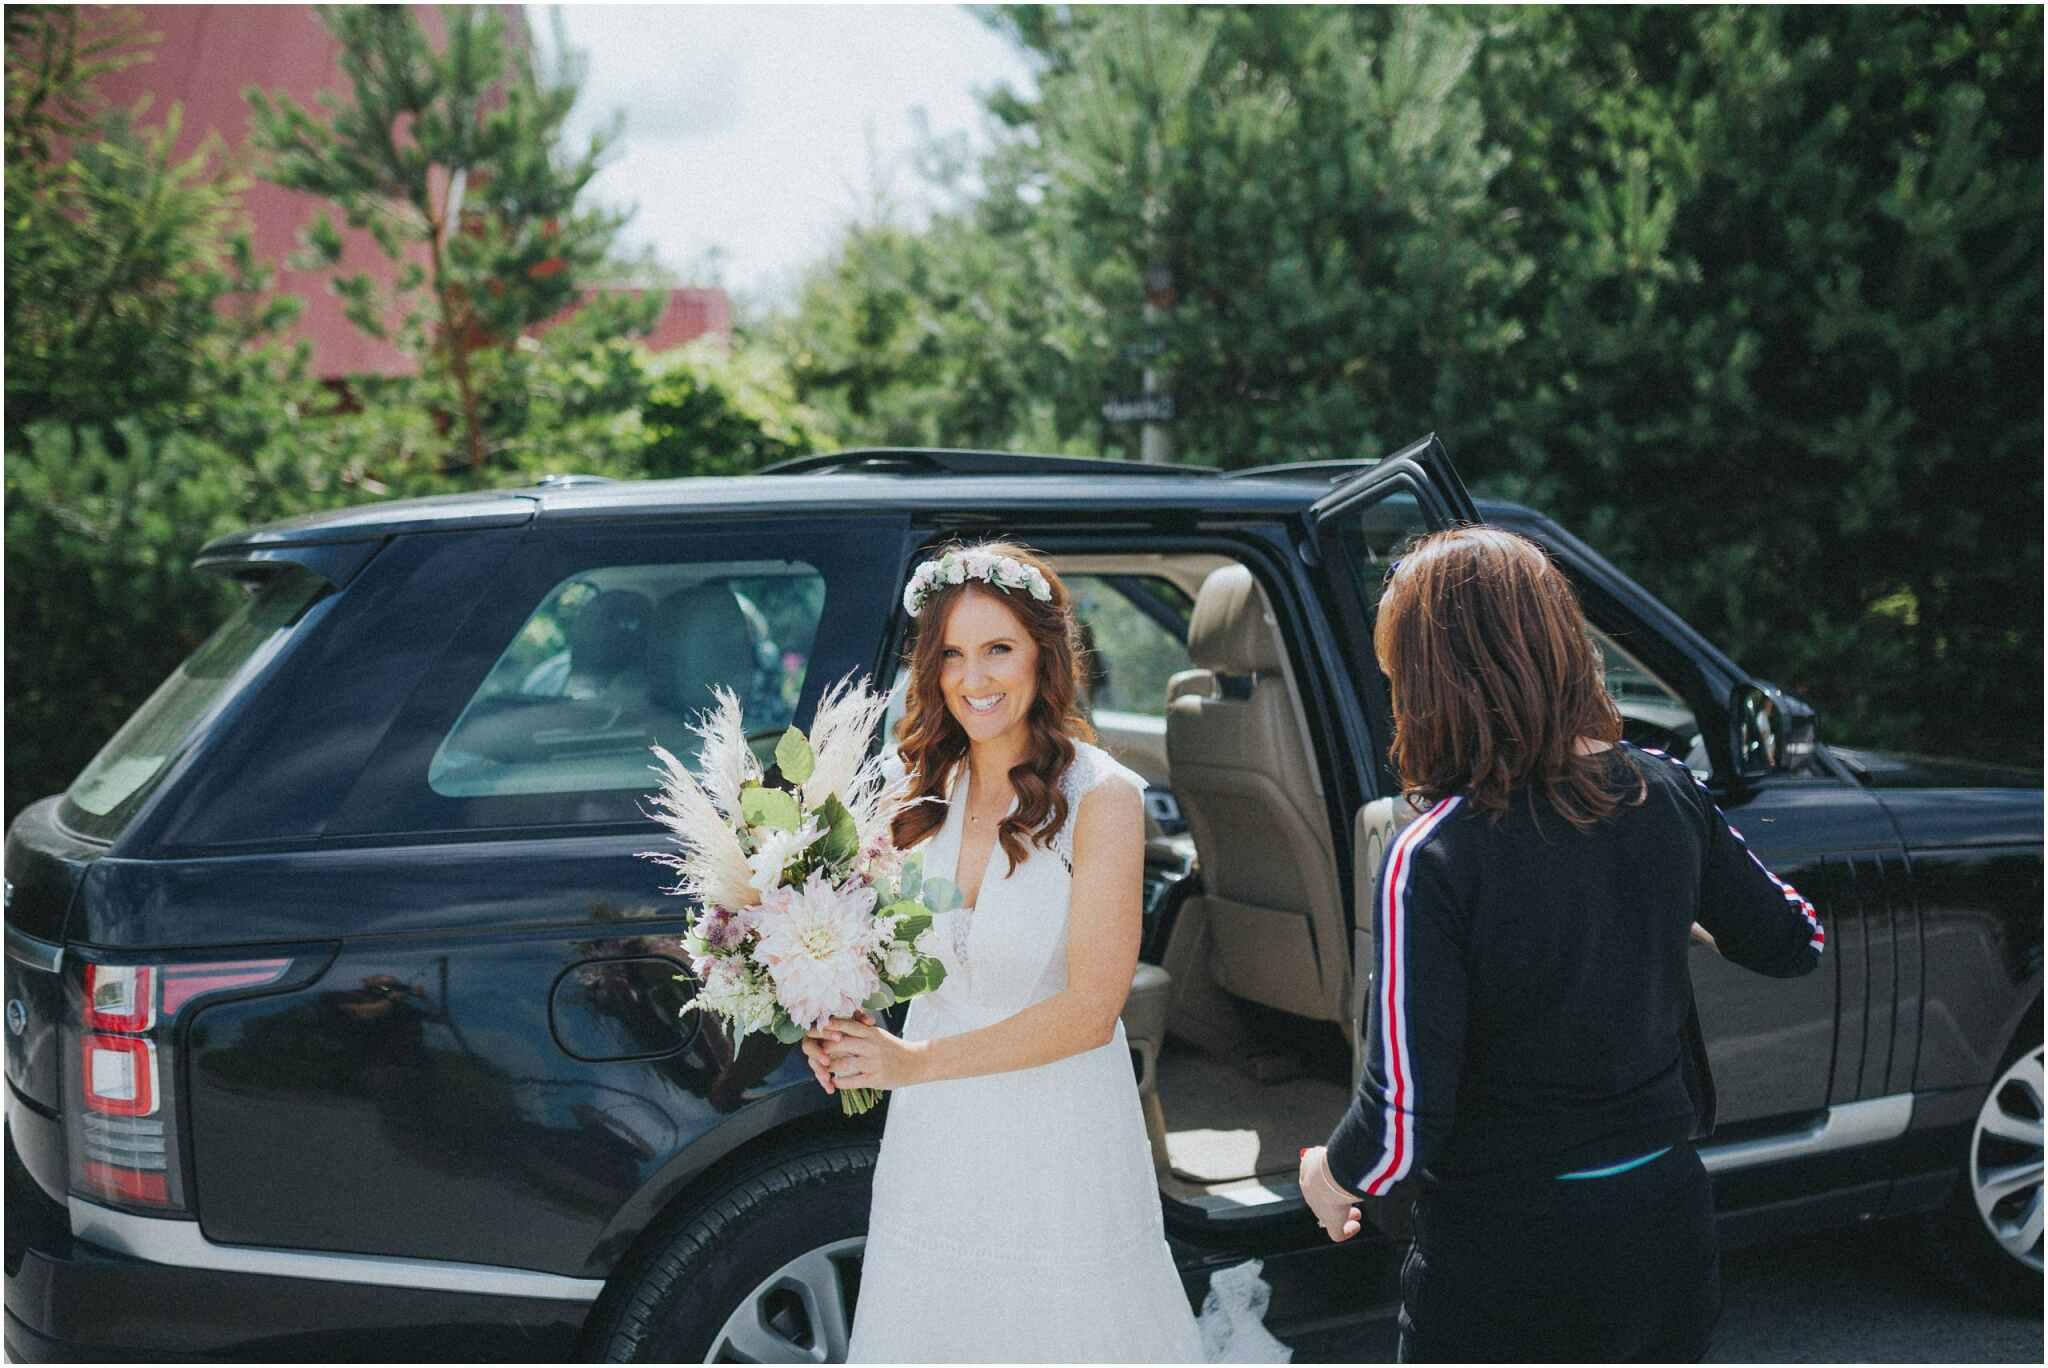 Fionnuala + Paul - Mount Druid Alternative Wedding 76